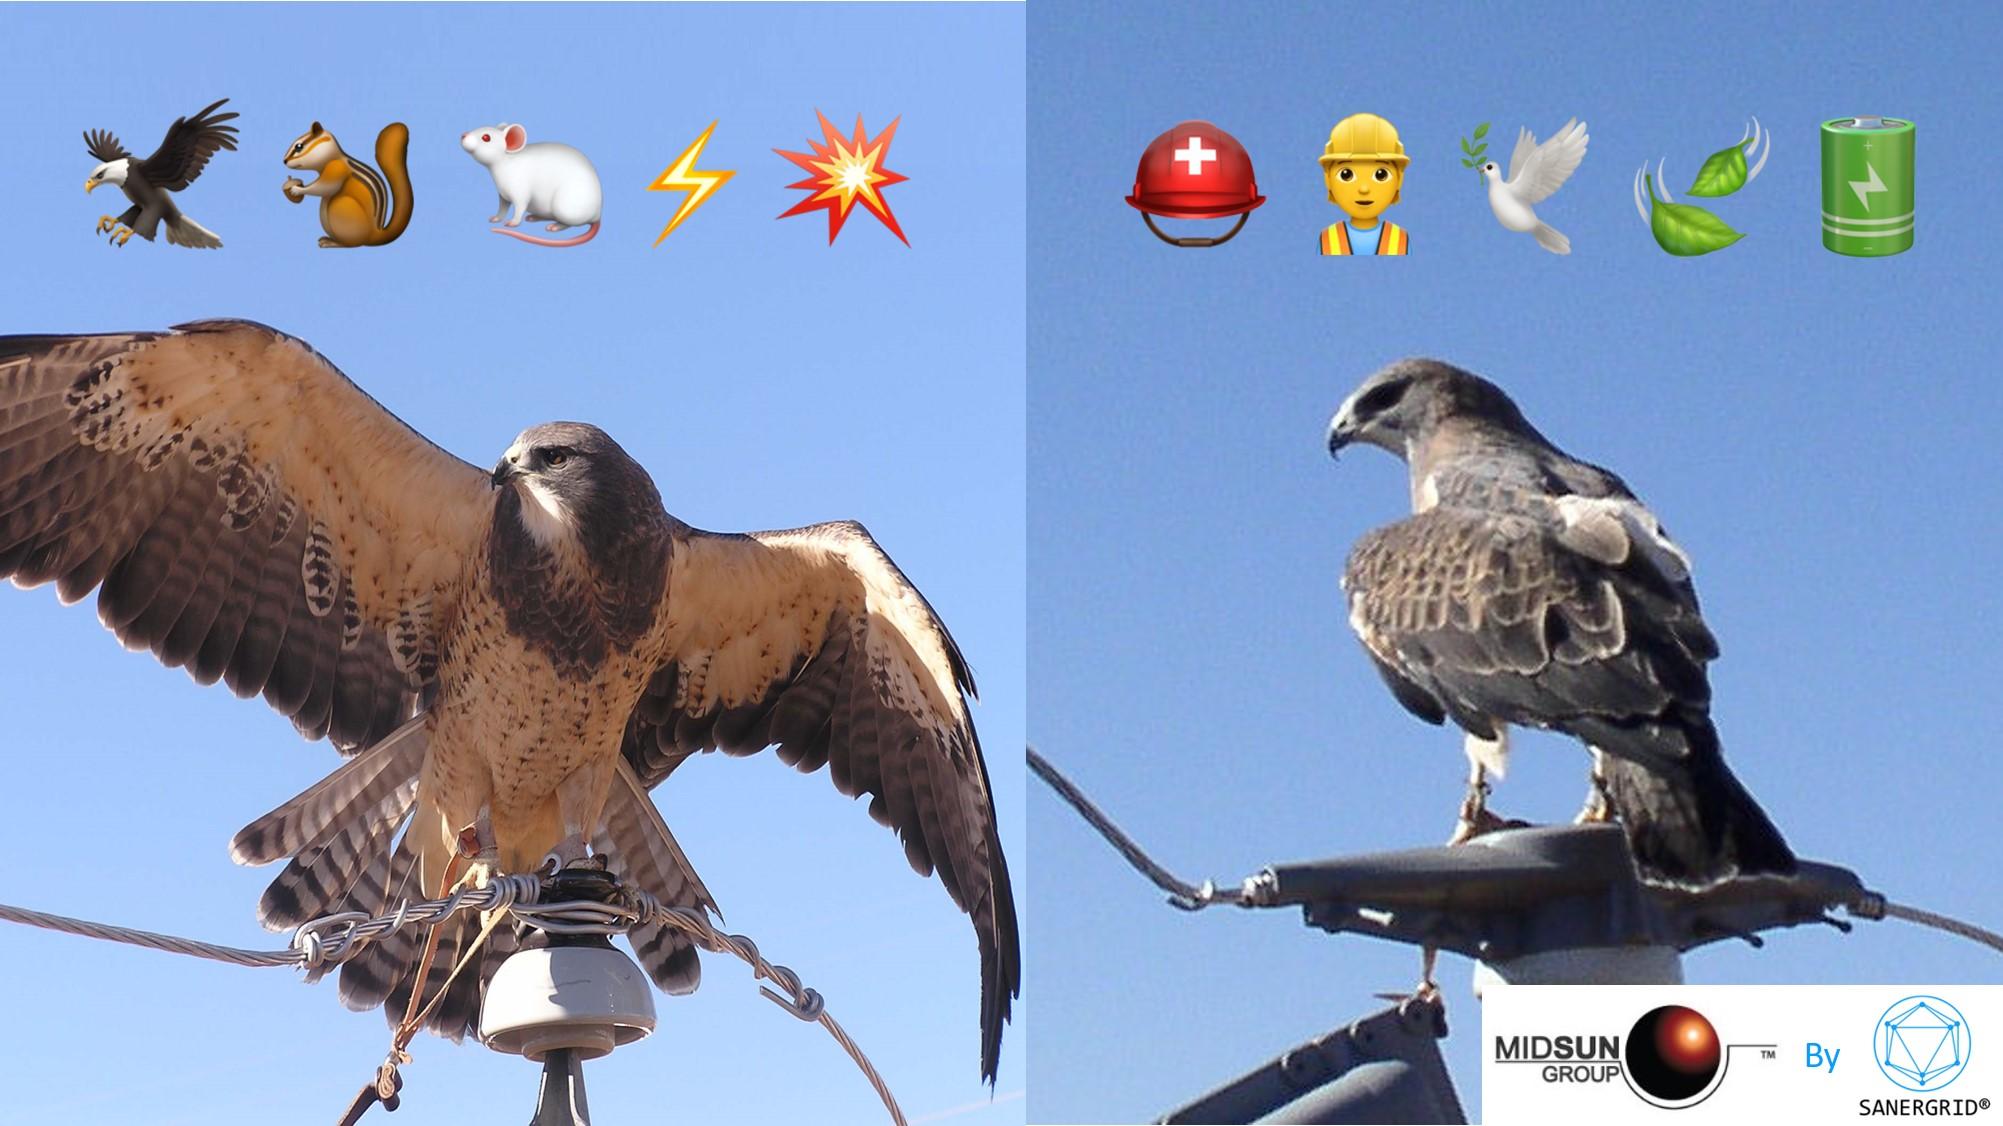 Gamme complète de protection anti intrusion avifaune animale poste haute tension MIDSUN gamme E samergrid